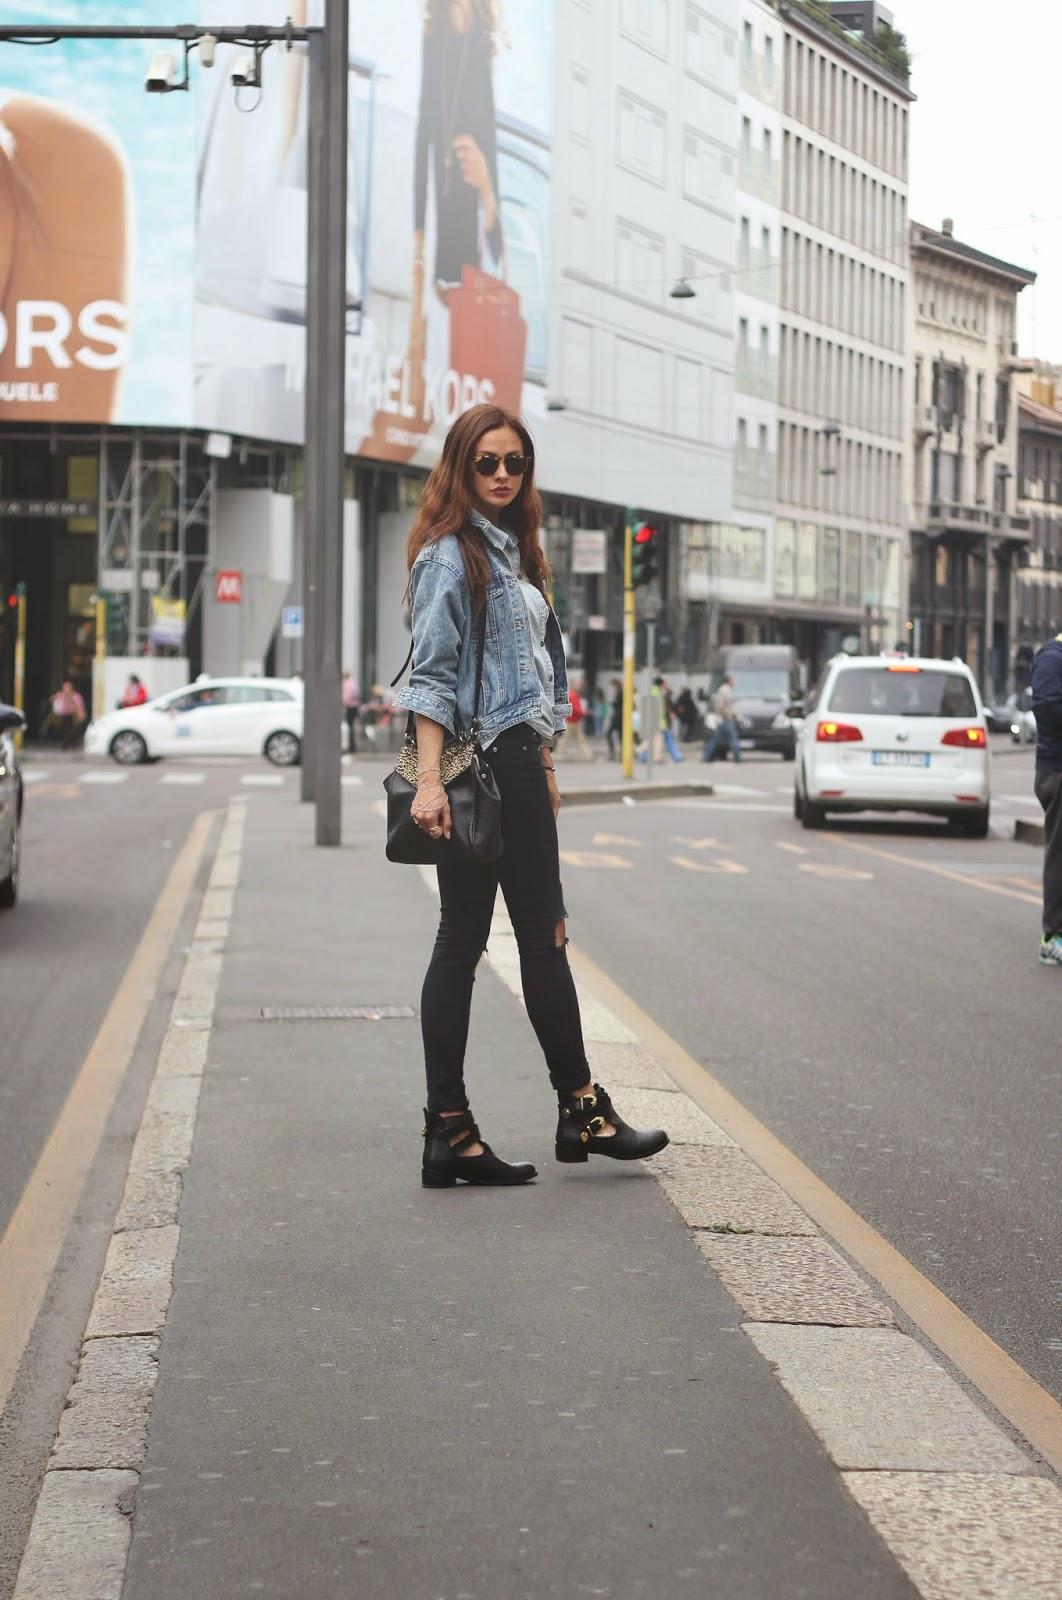 Taxi a San Babila con Ripped jeans